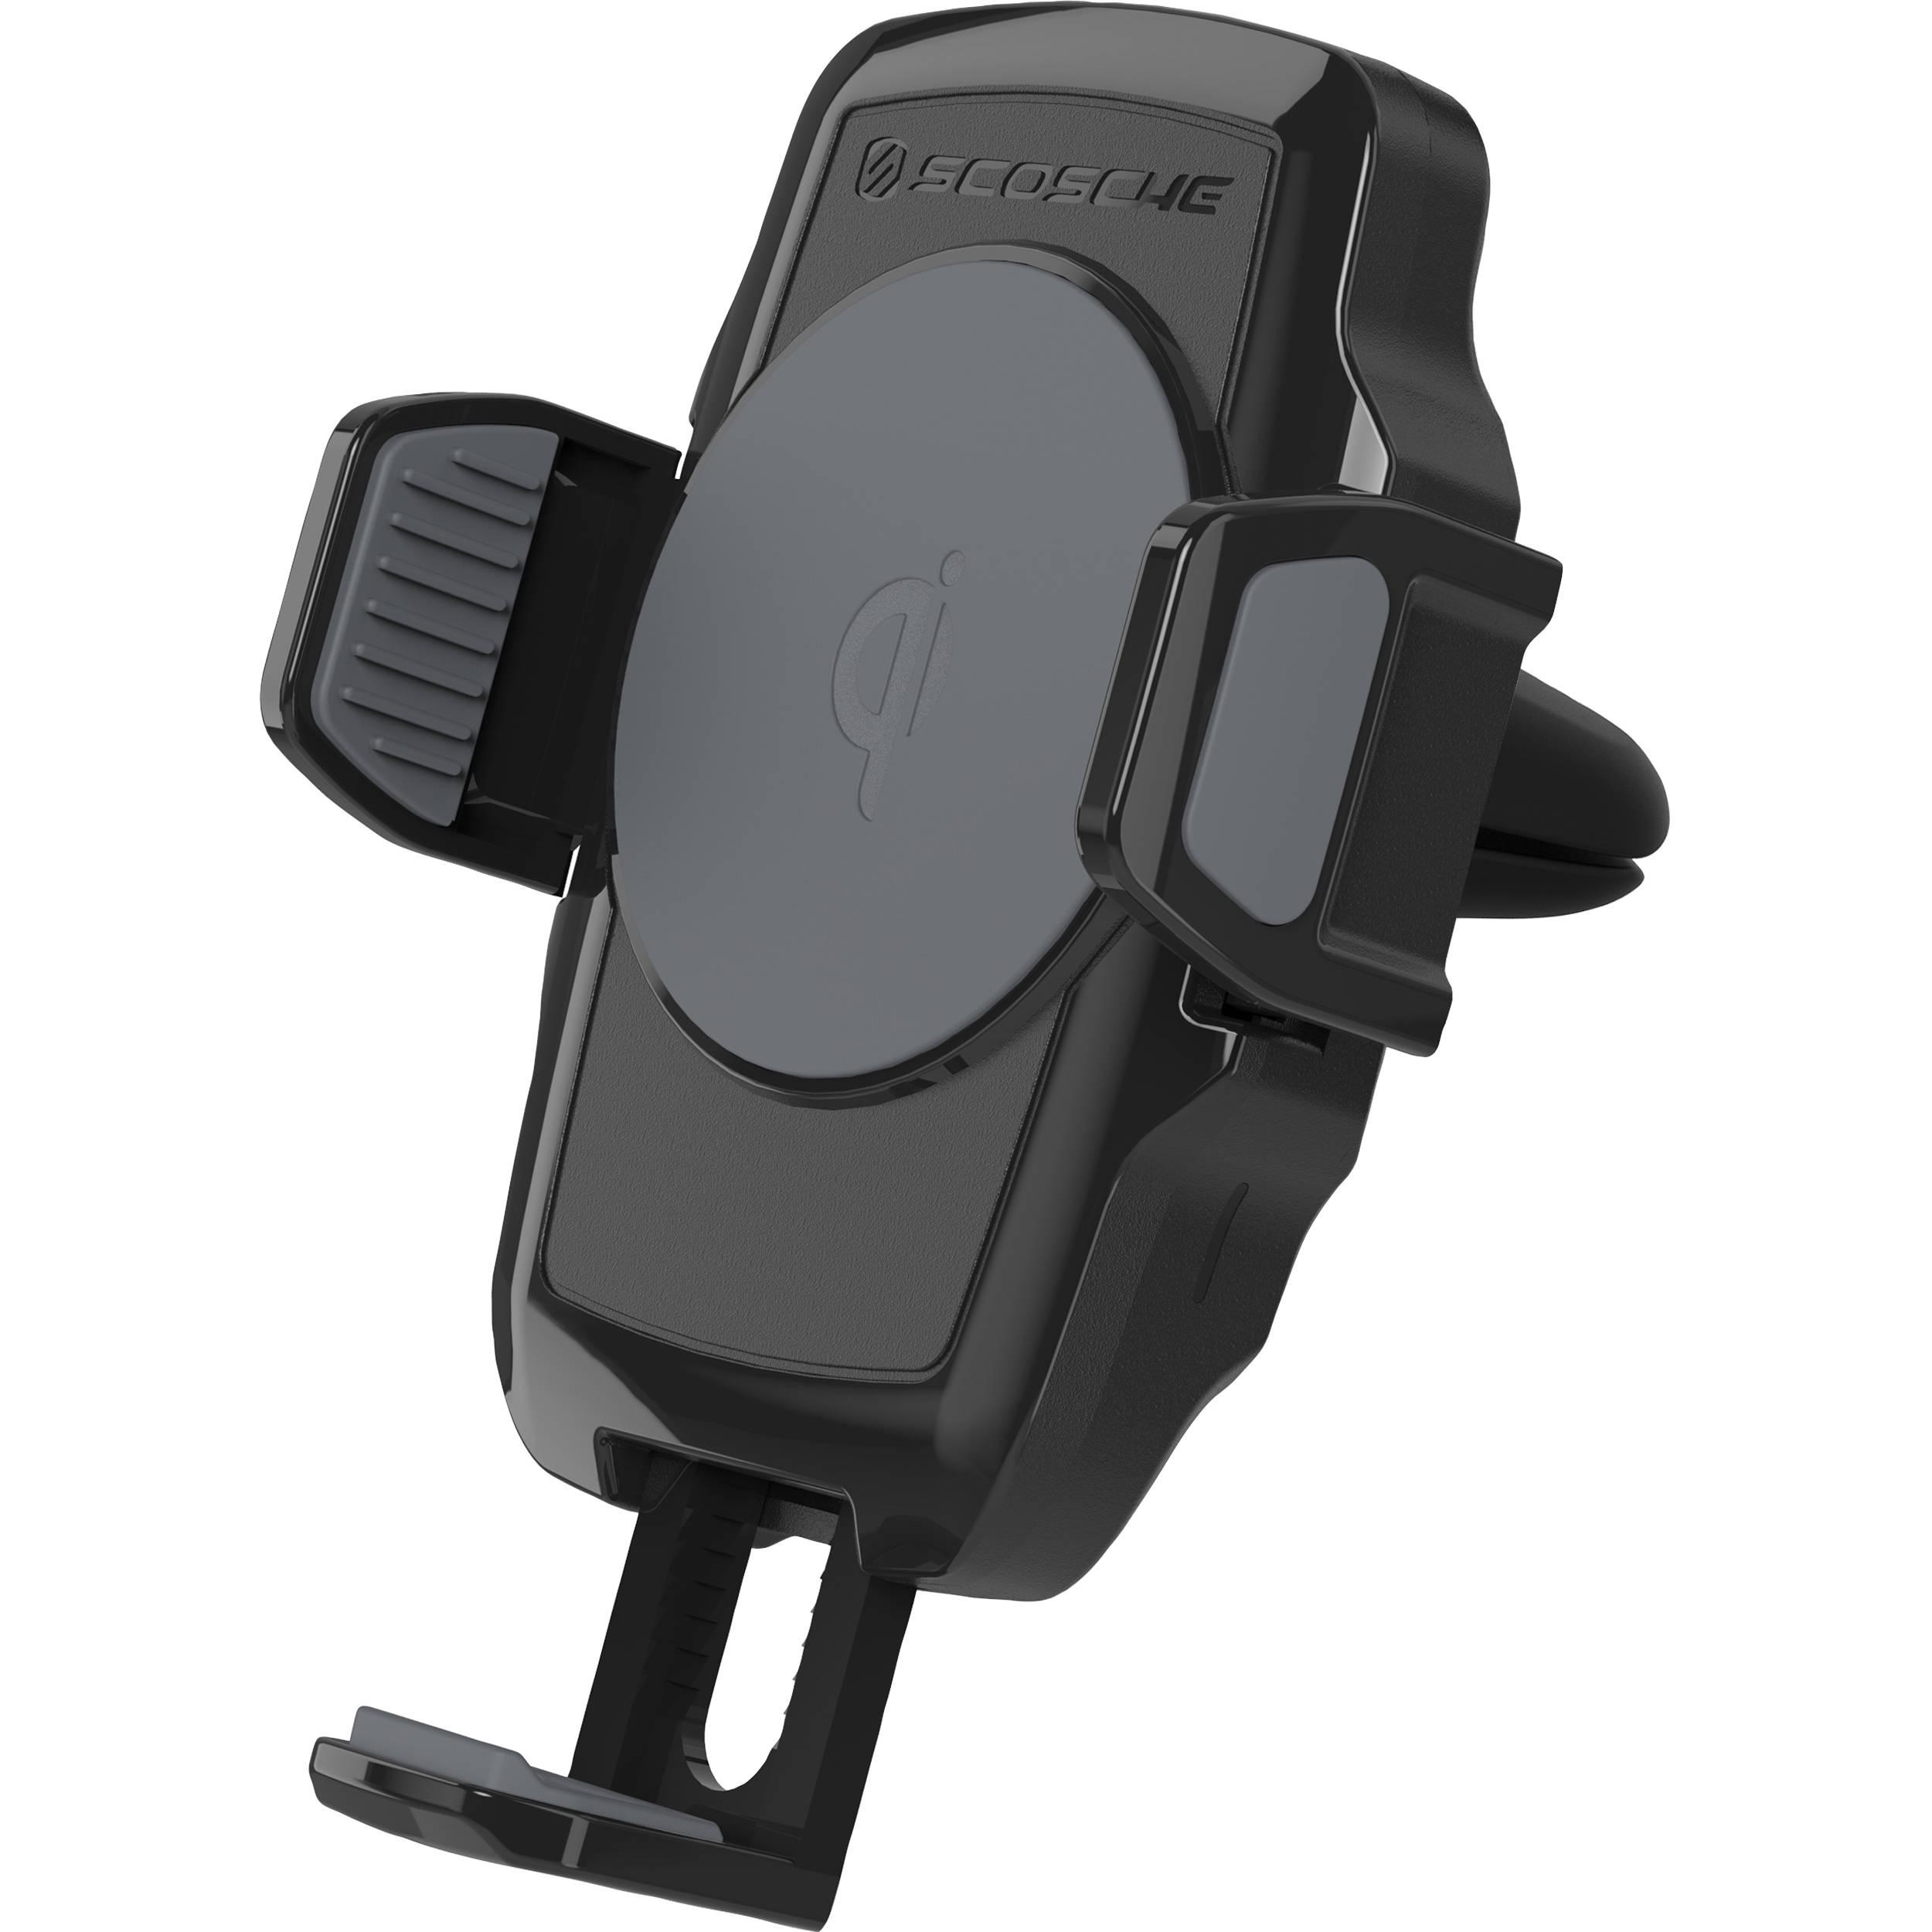 Scosche Ventmount Qi Wireless Charging Universal Vent